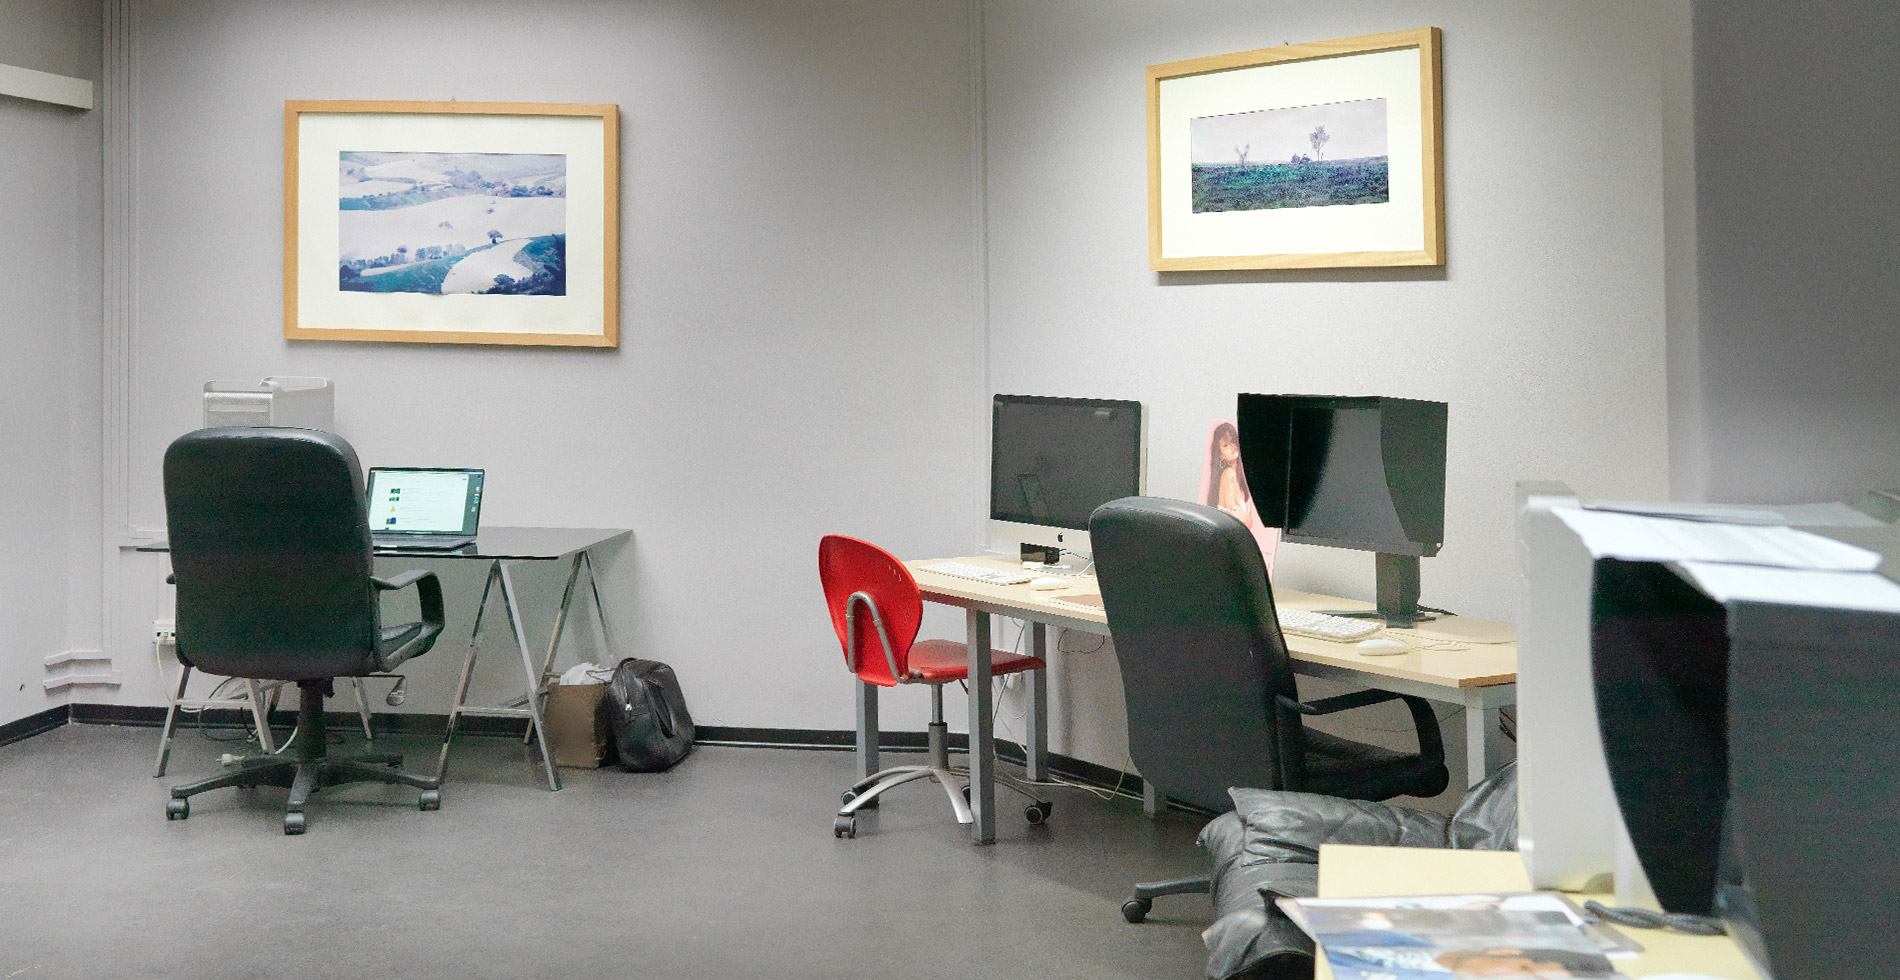 sala-grafica-studio-fotografico-stampa-bergamo-modonesi-2